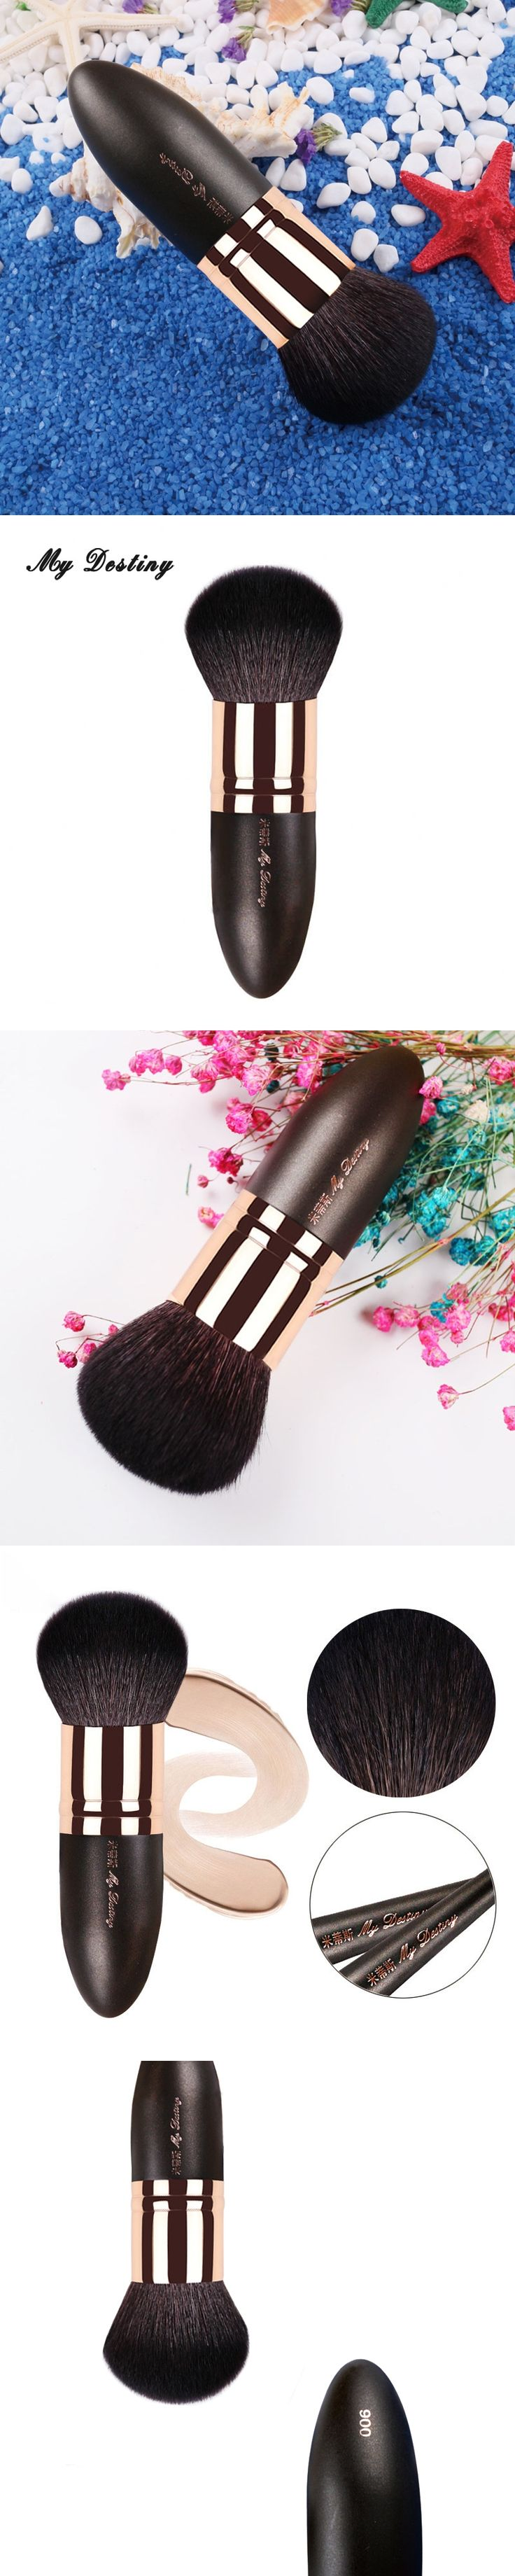 MY DESTINY Goat Hair Round Powder Brush Kabuki Make Up Makeup Brushes Pincel Maquiagem Brochas Maquillaje Make Up Kwasten 006